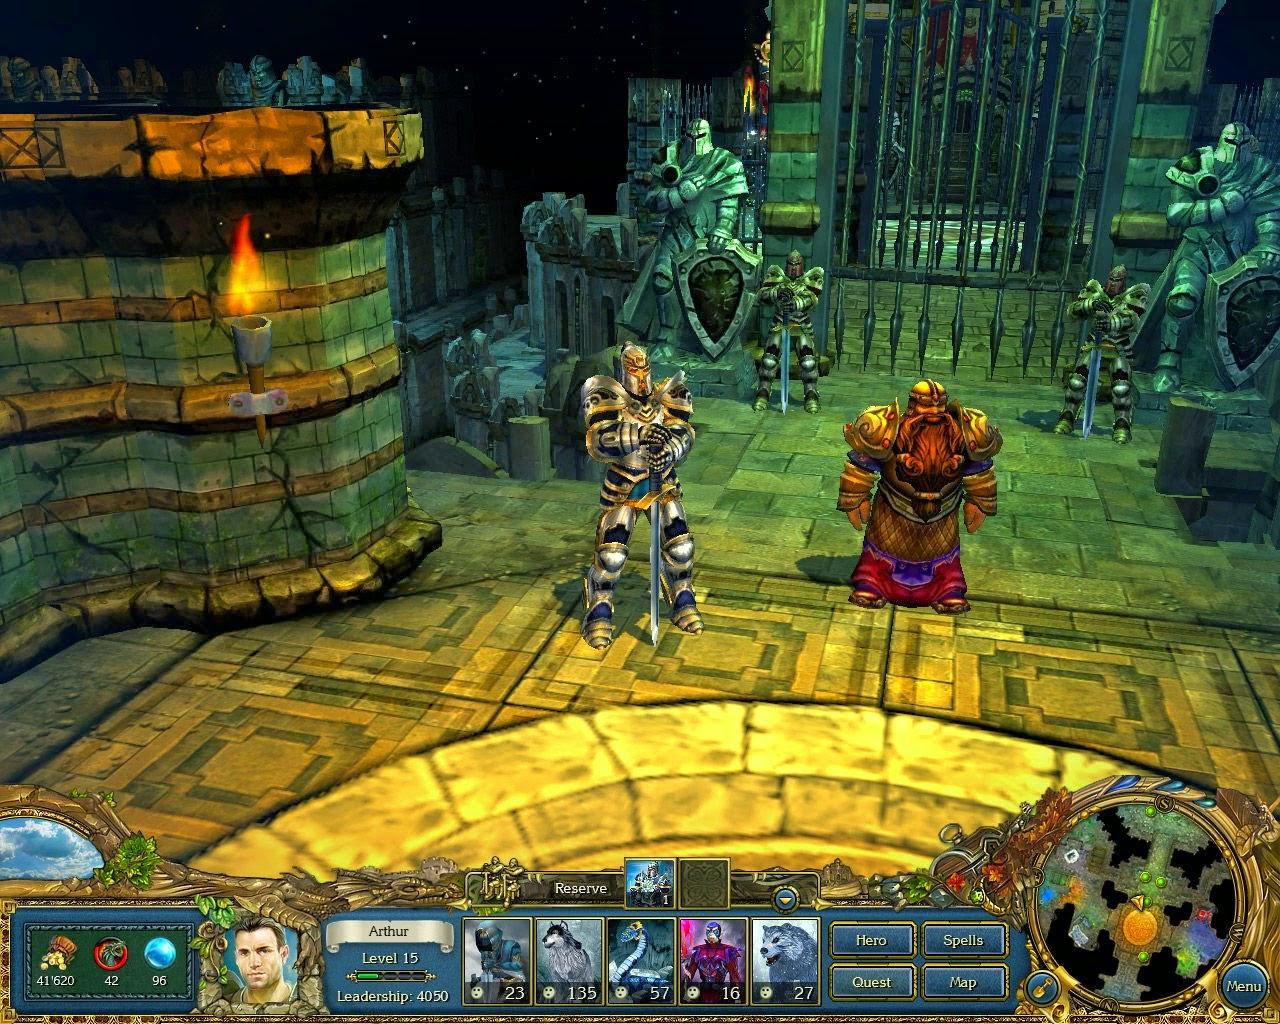 Kings Bounty Crossworlds PC-GAME